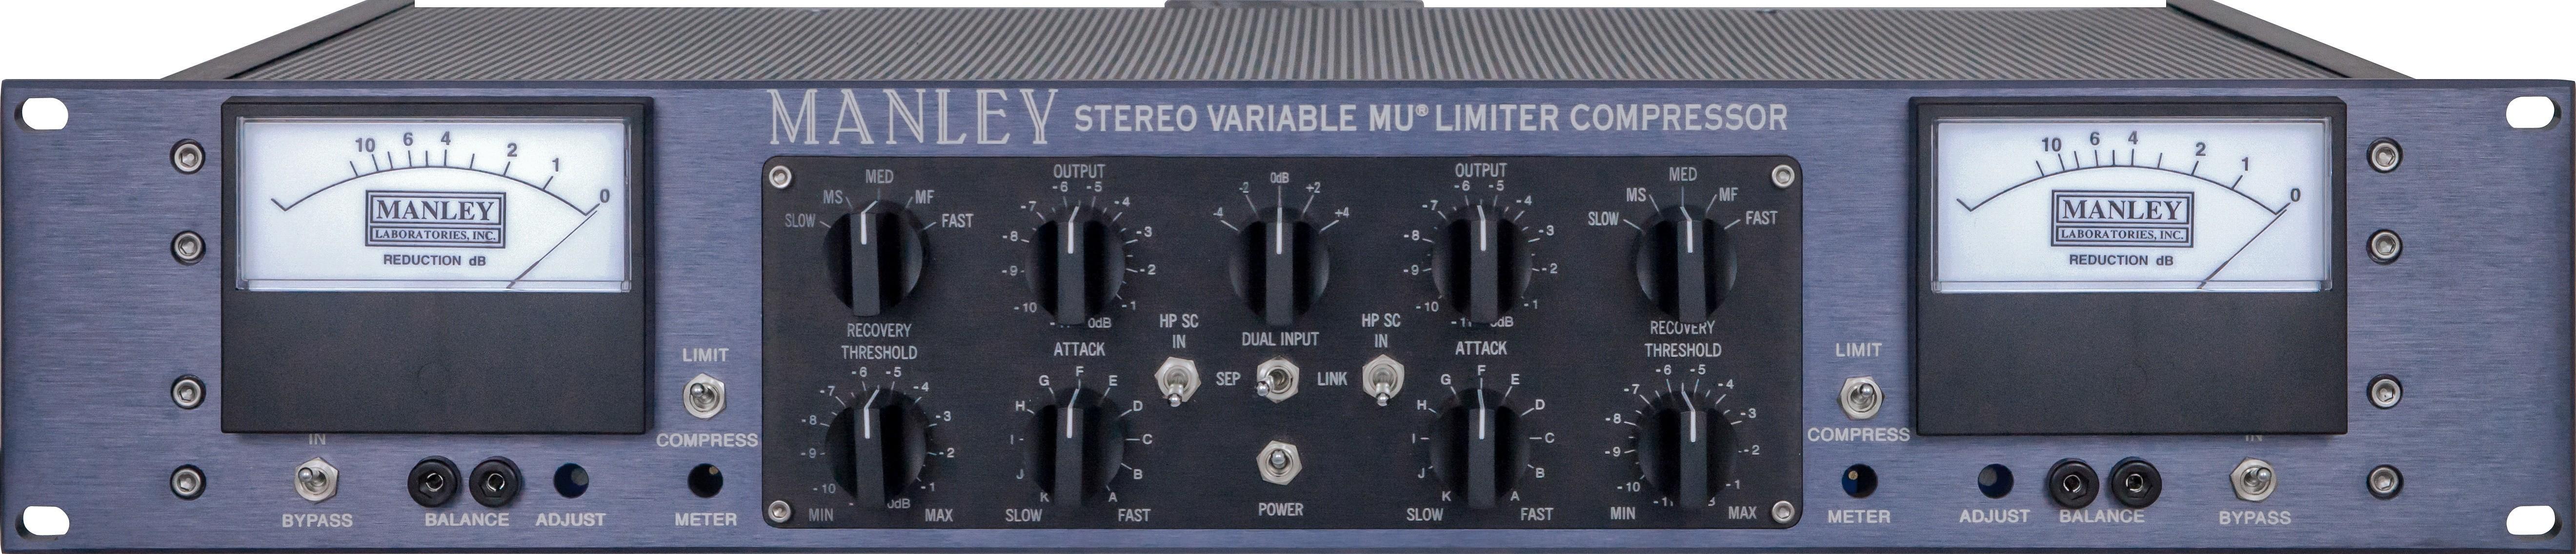 Manley Vari MU Stereo Limiter Mastering Version